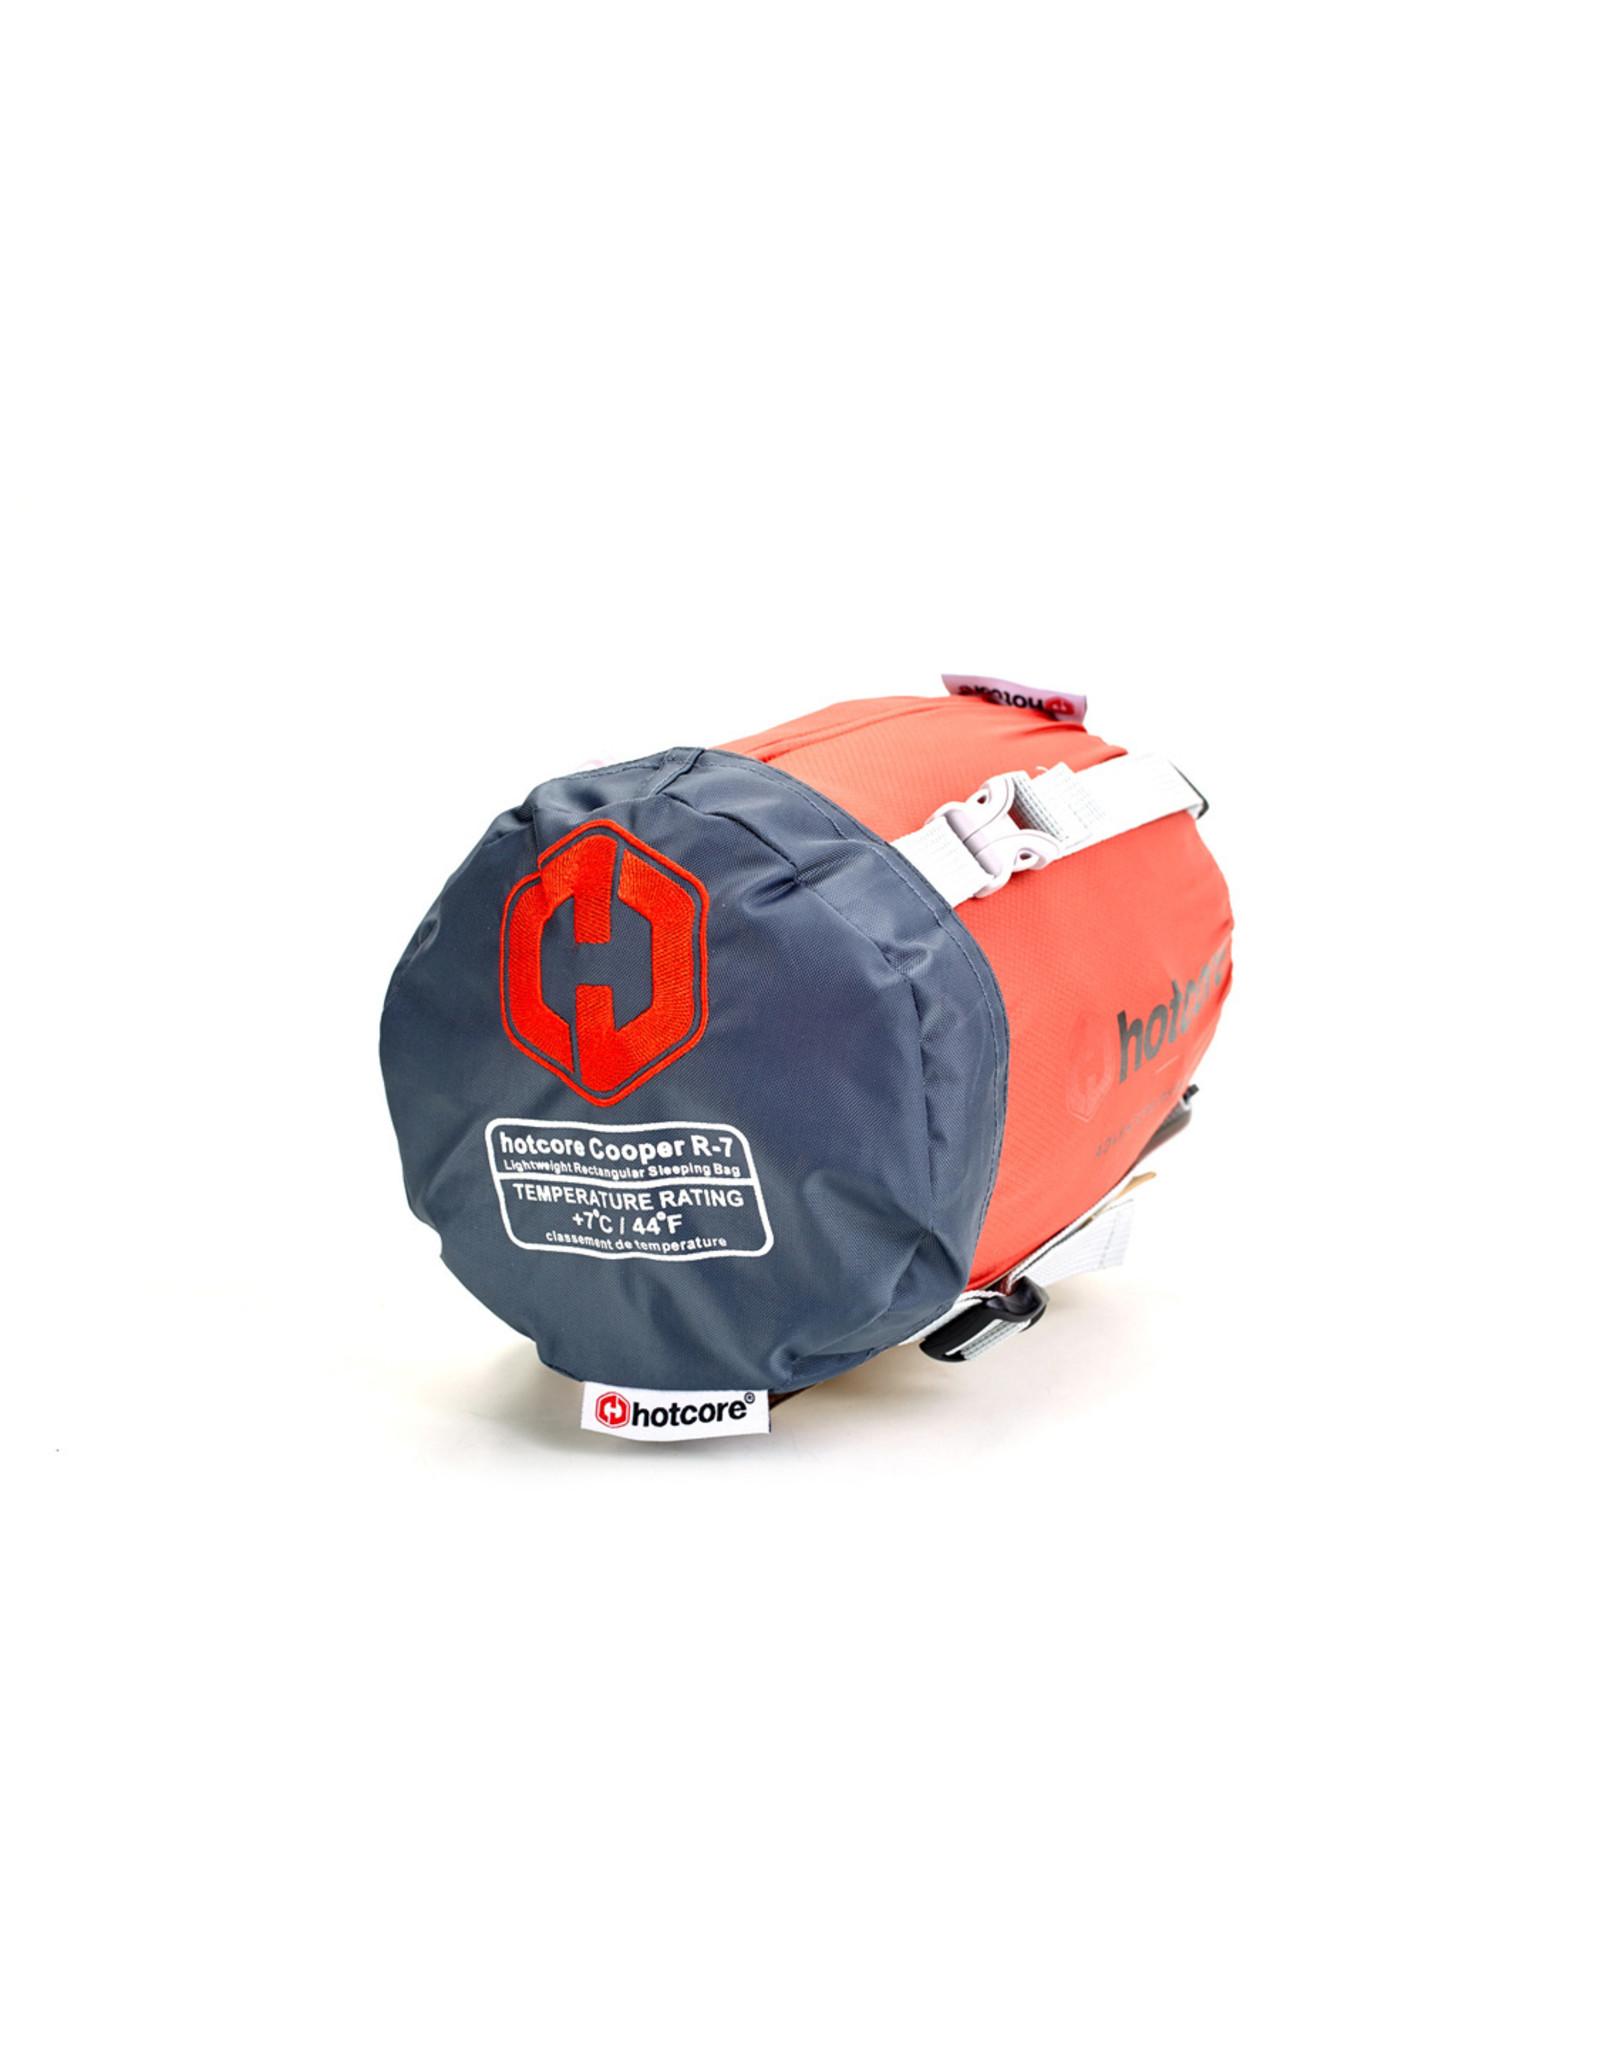 HOTCORE HOTCORE-COOPER R-7- LIGHTWEIGHT RECTANGULAR SLEEPING BAG, BURNT ORANGE- 7C/44F